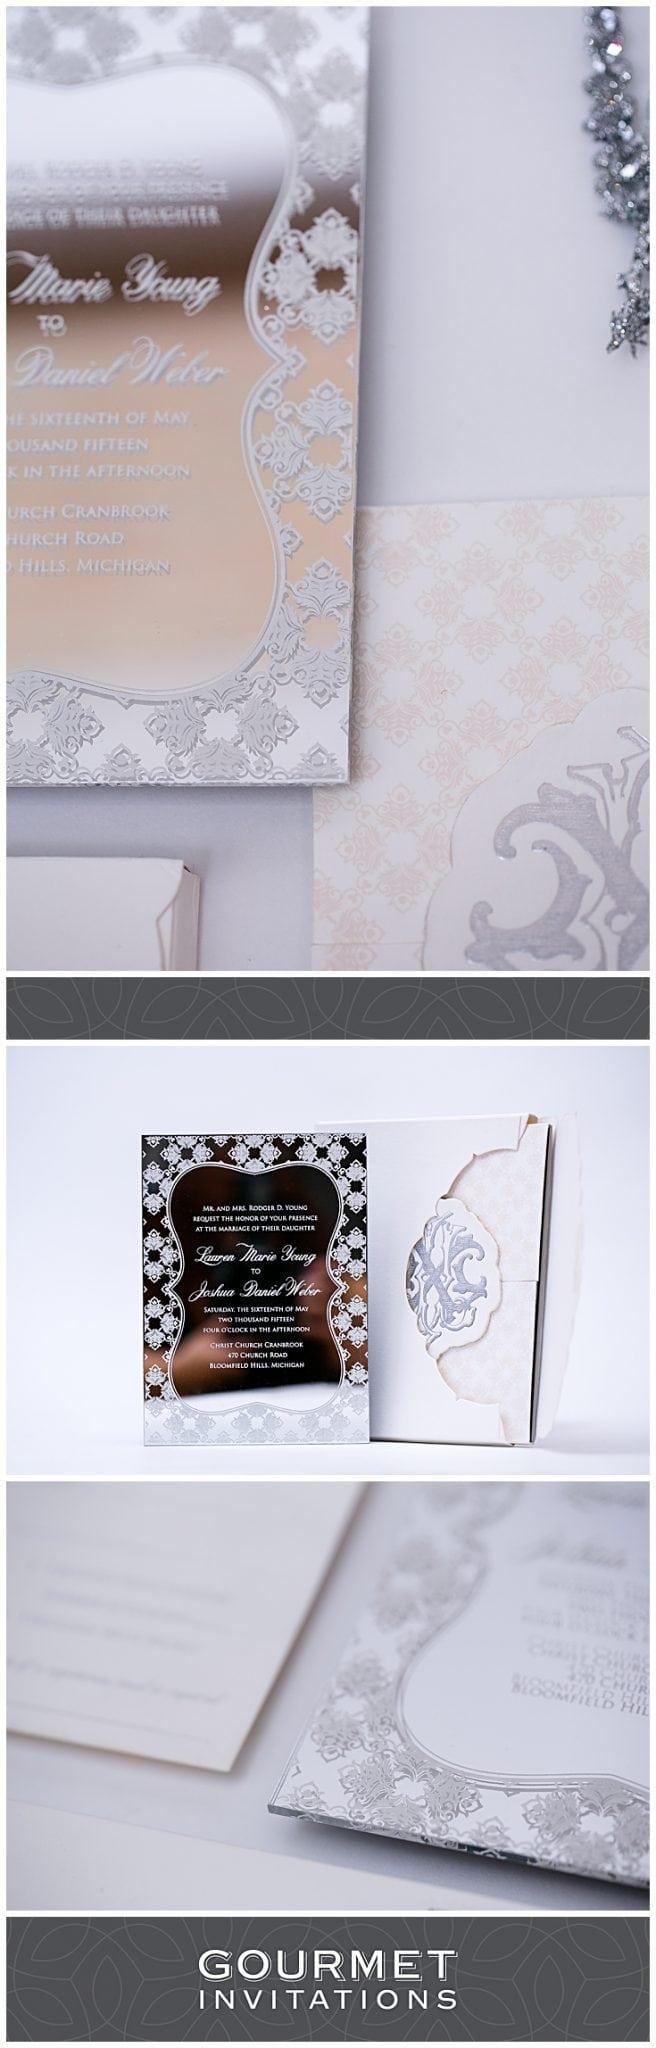 mirror-wedding-invitations_0003